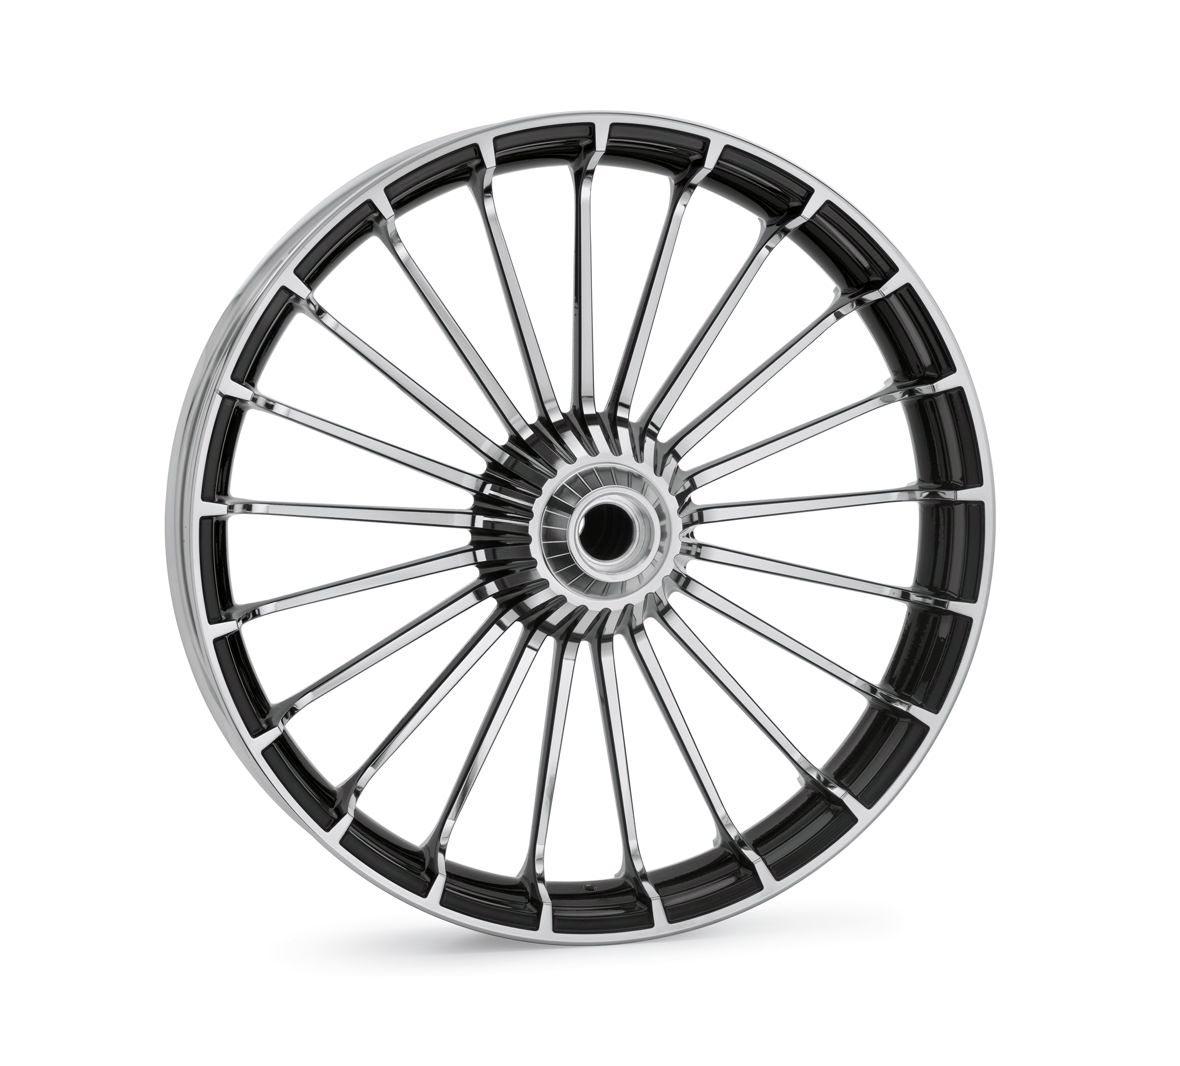 Turbine Custom 3 5x21 Front Wheel